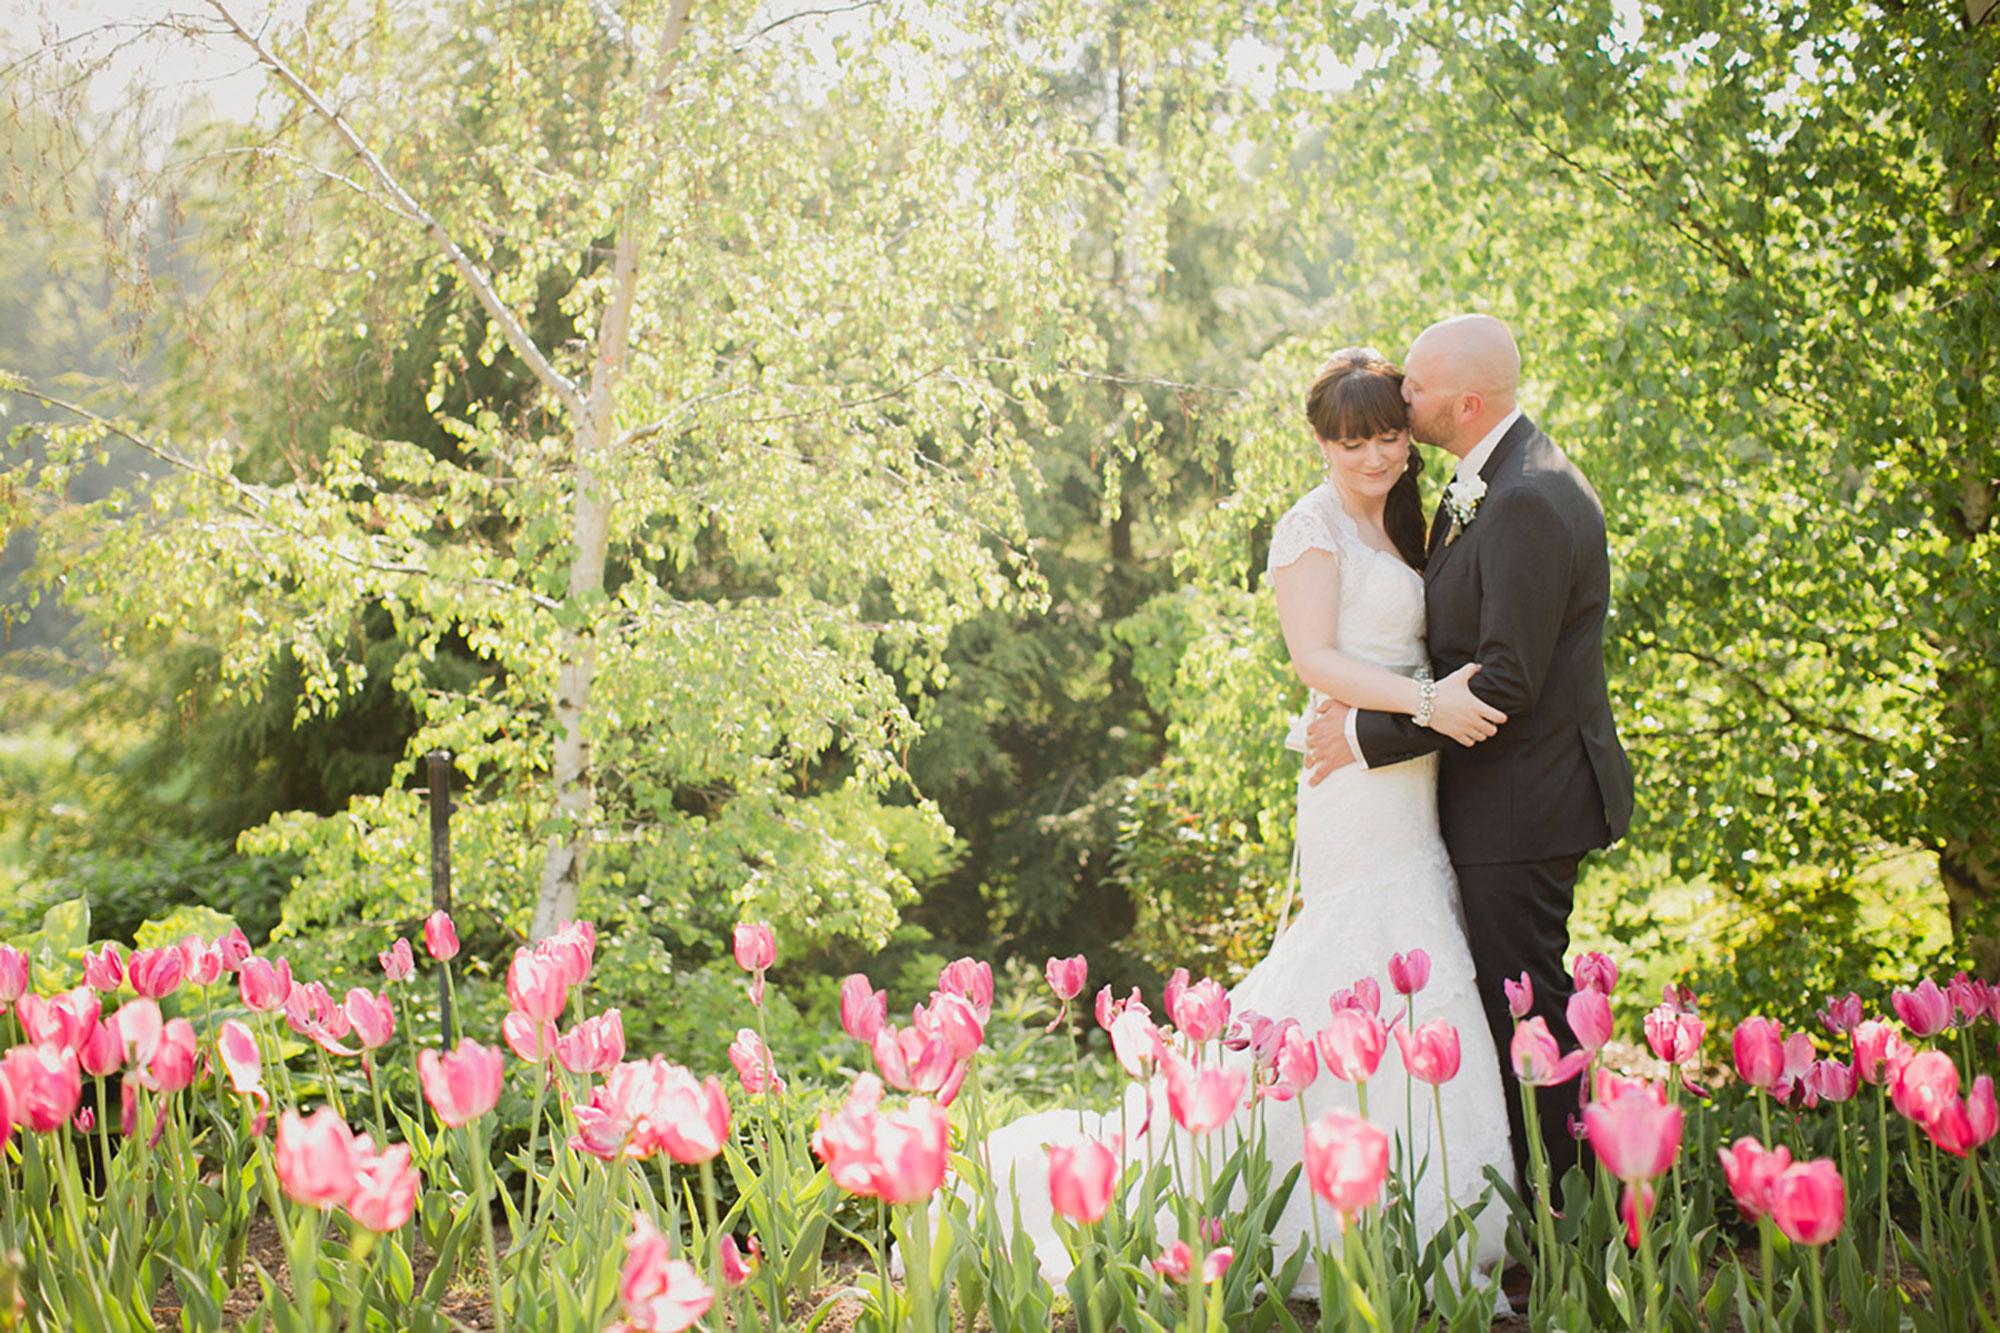 Balls-Falls-Vineyard-Bride-Photo-By-Elizabeth-in-Love-016.jpg